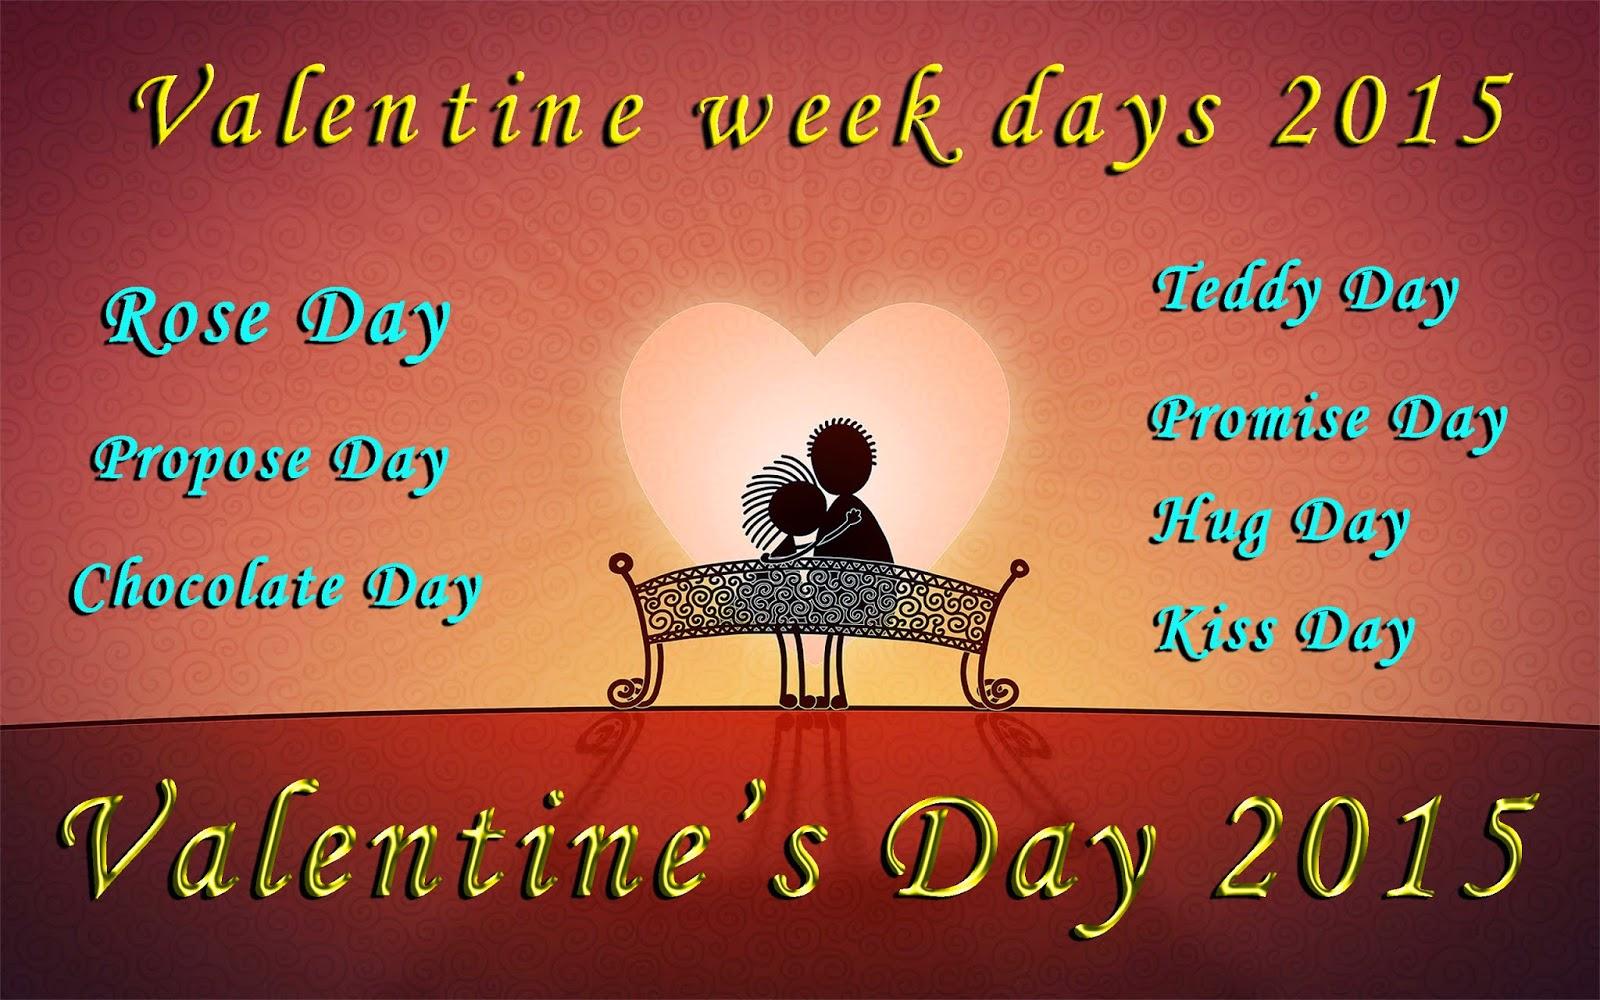 Valentines Week days 2015 Happy Rose day, Happy Propose day, Happy Hug Day, Happy Kiss day, Happy Chocolate day